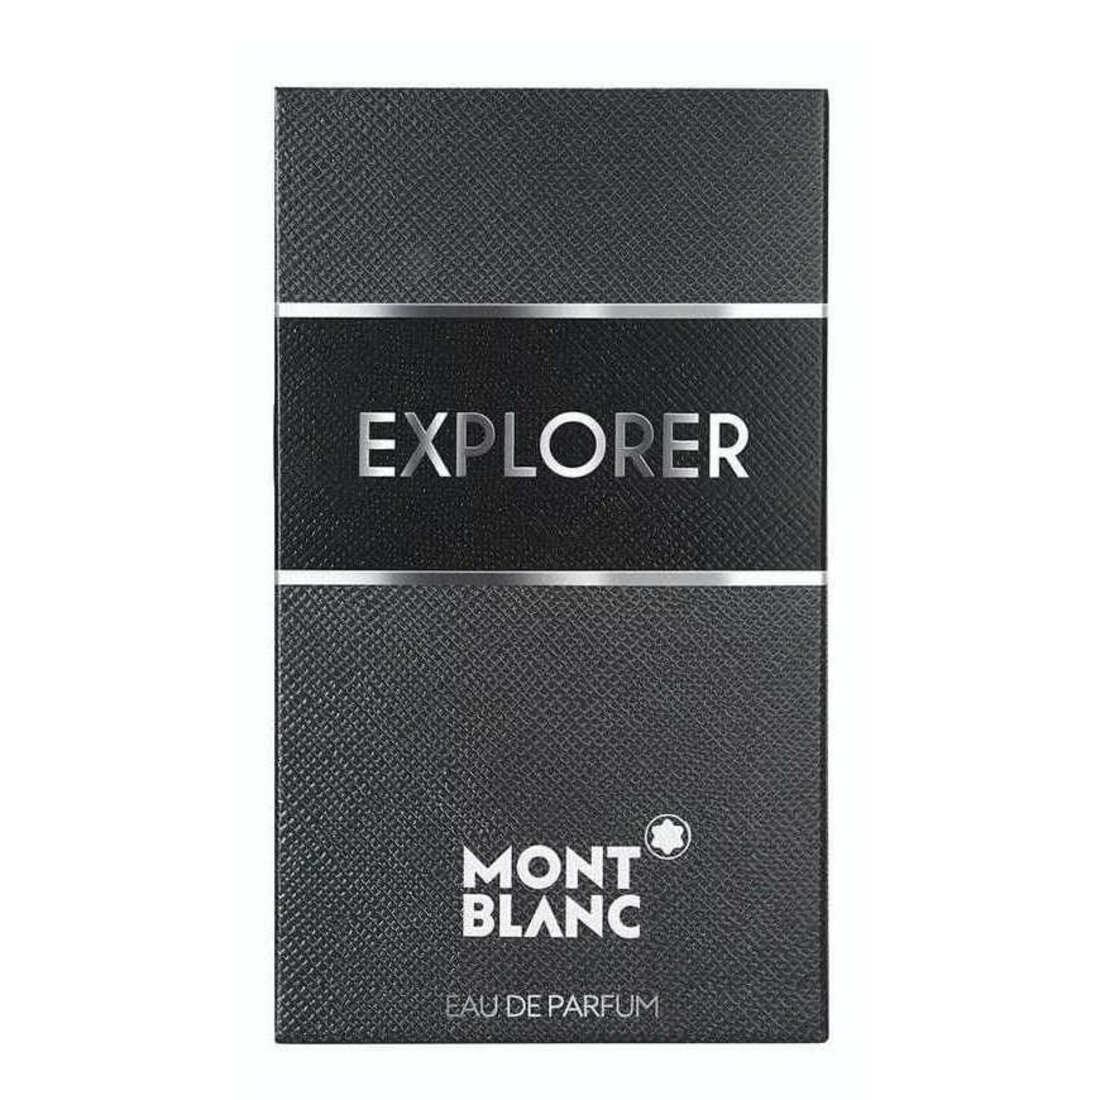 Perfume Masculino MontBlanc Explorer Eau de Parfum 30ml